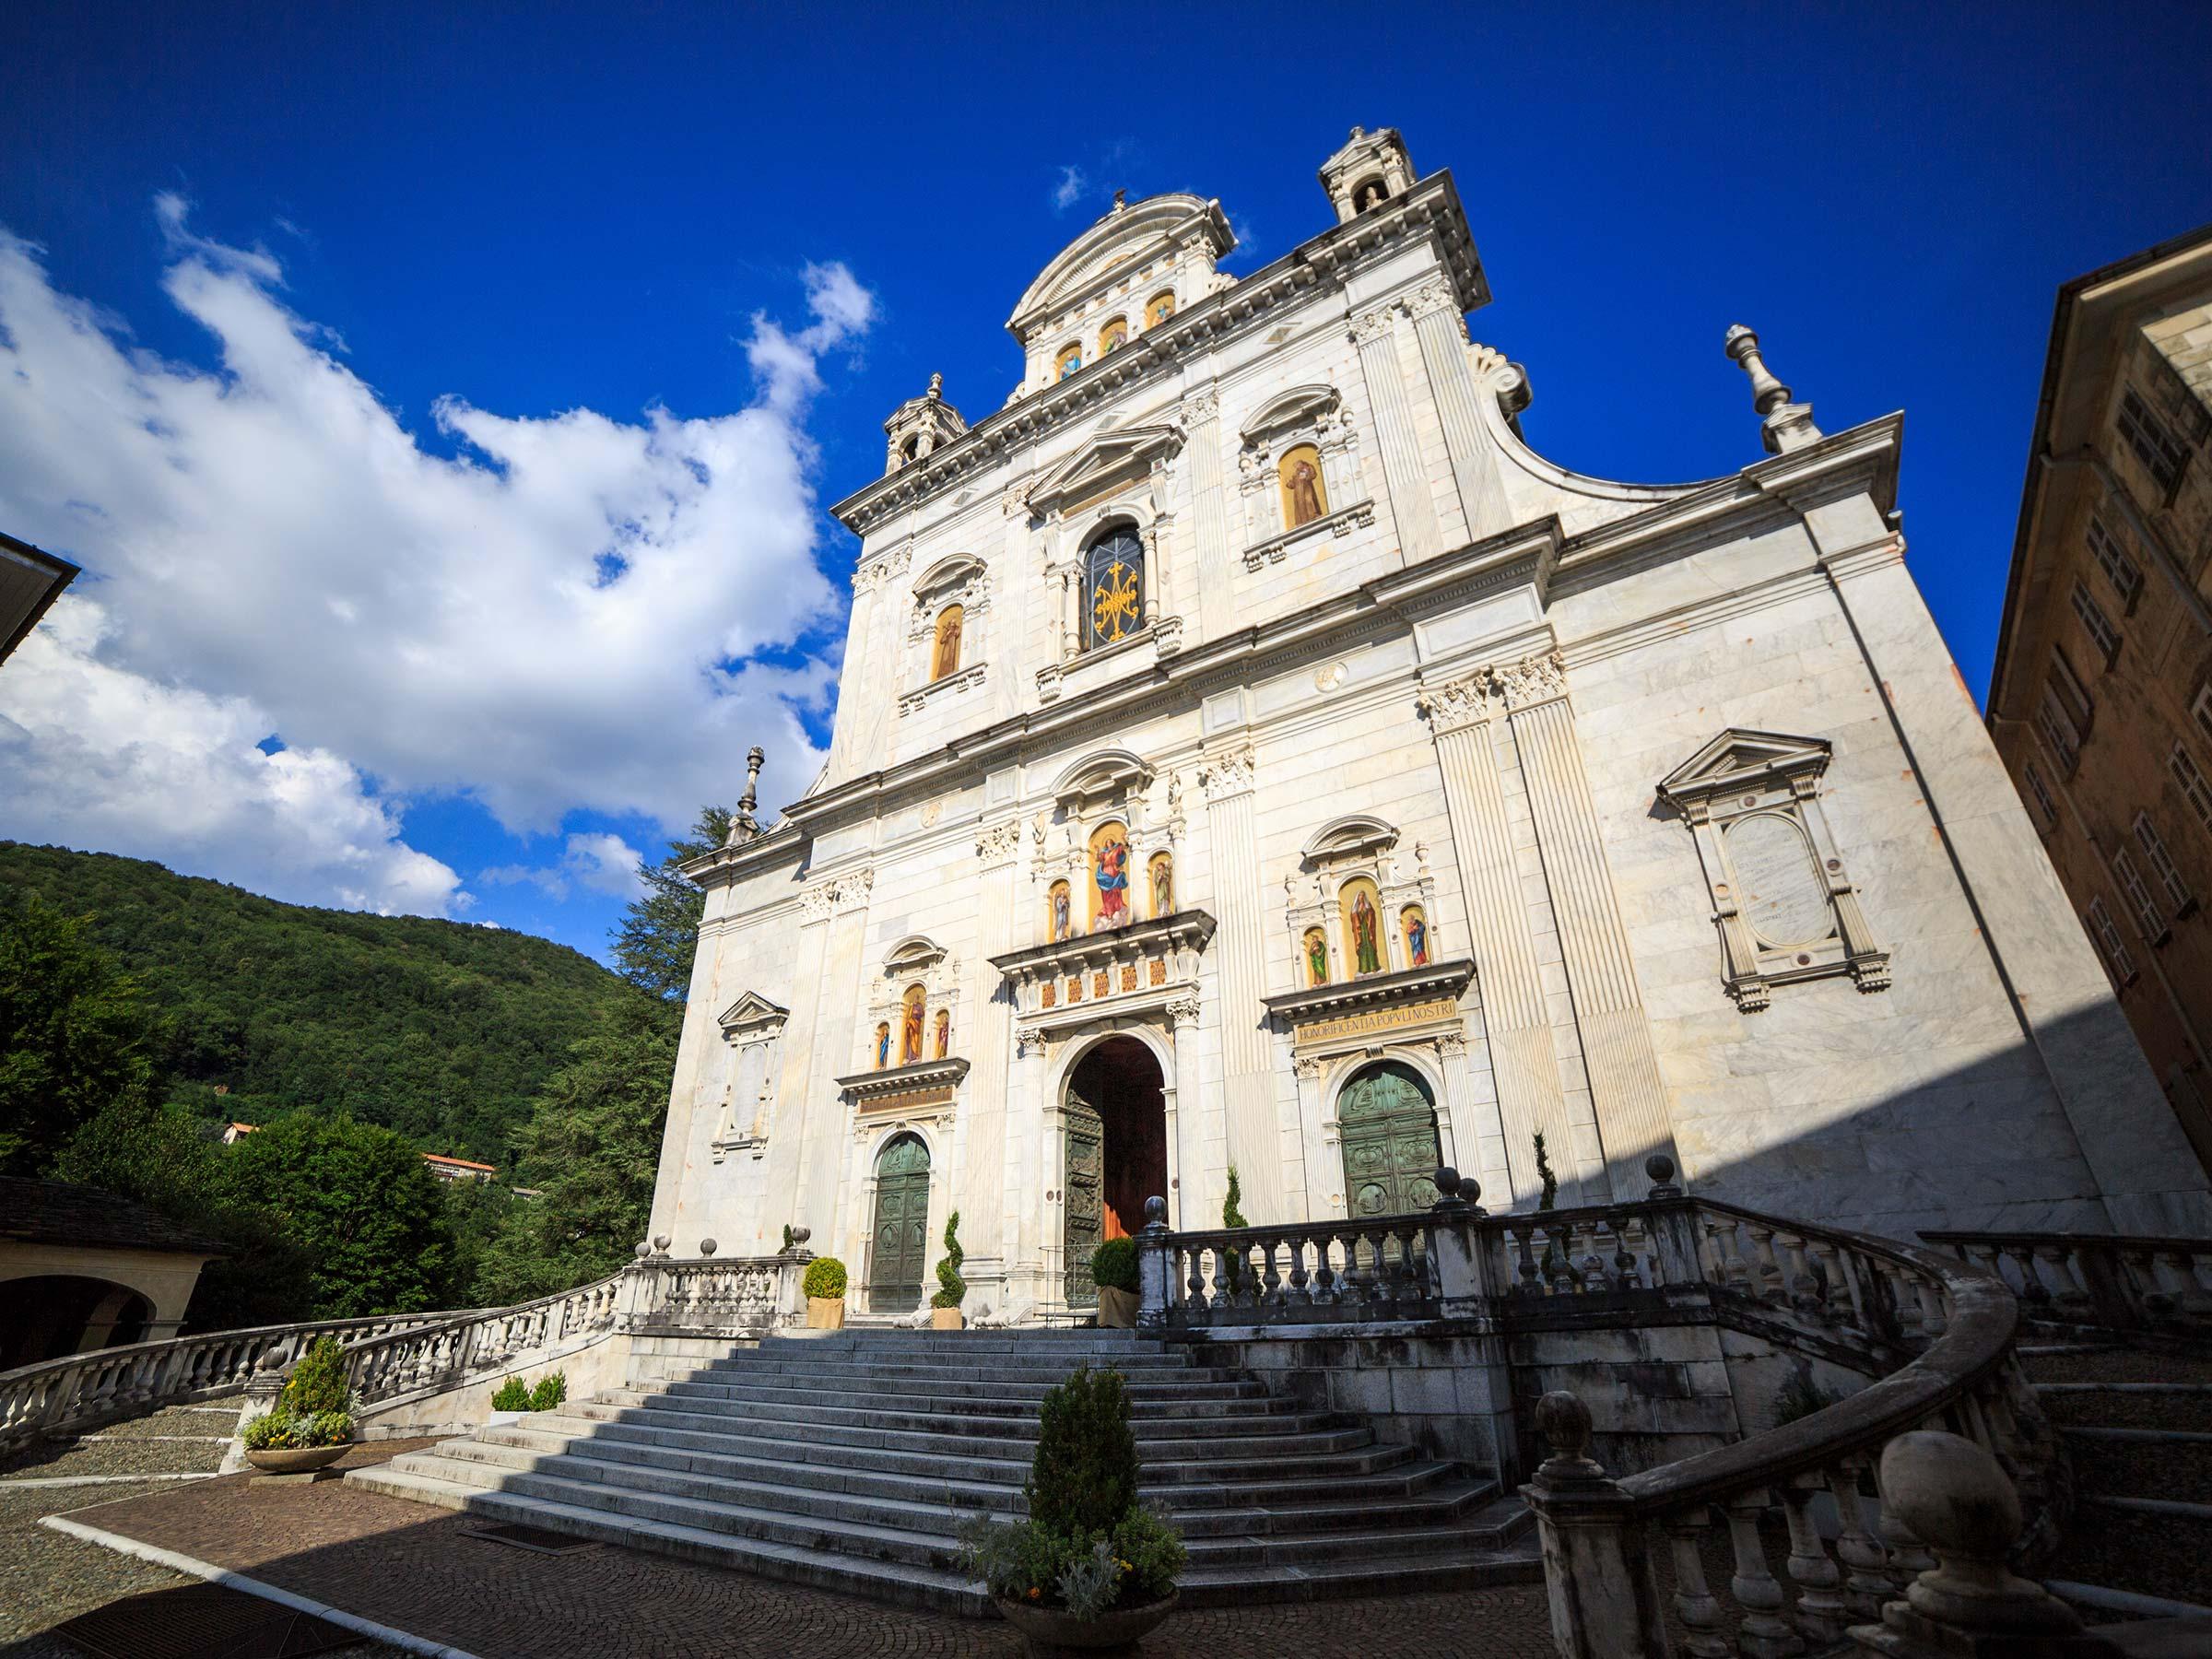 Sacro Monte di Varallo basilica